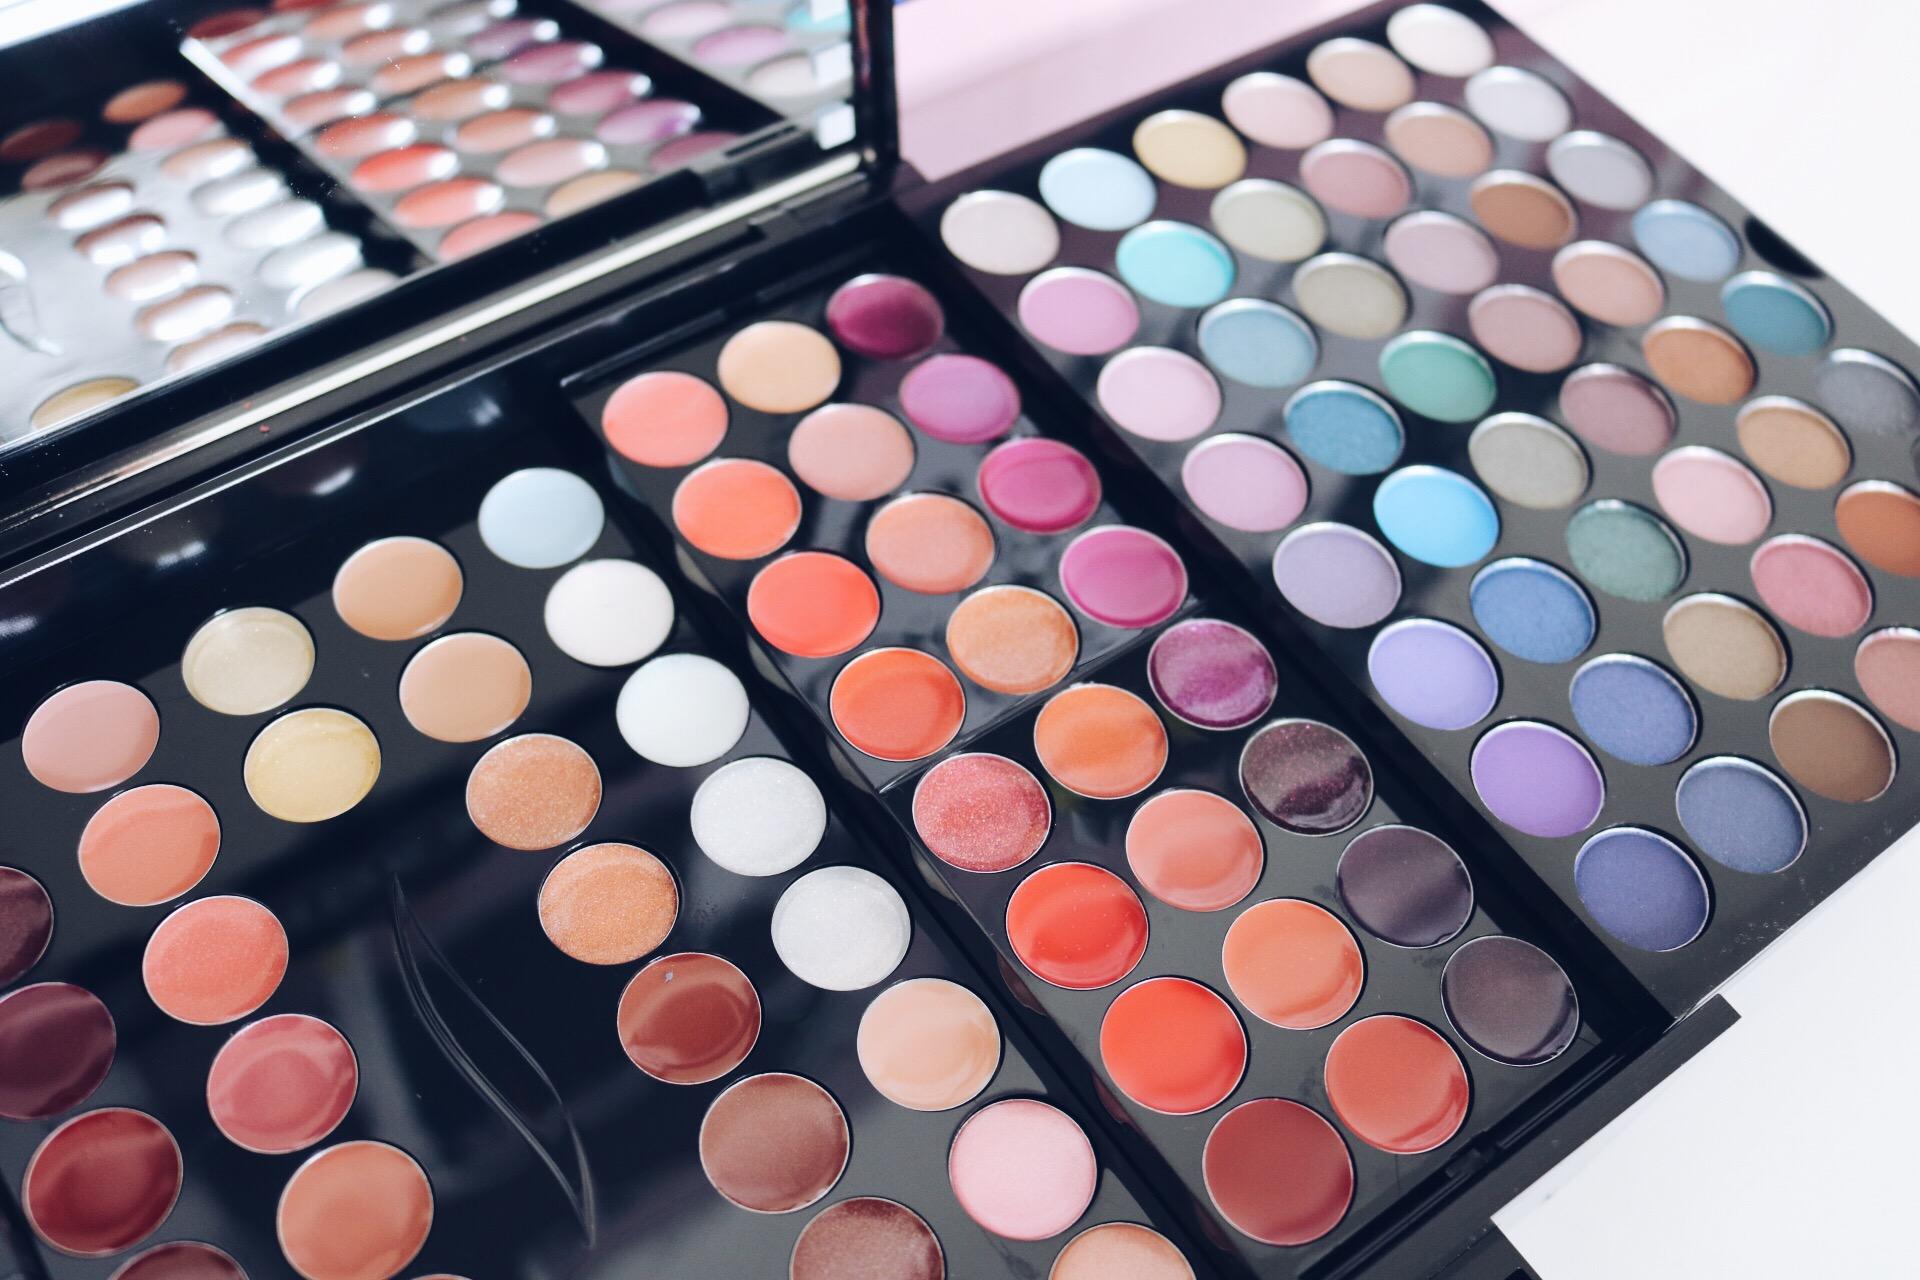 Sephora Palette Makeup Studio läpprodukter palett läpp palett